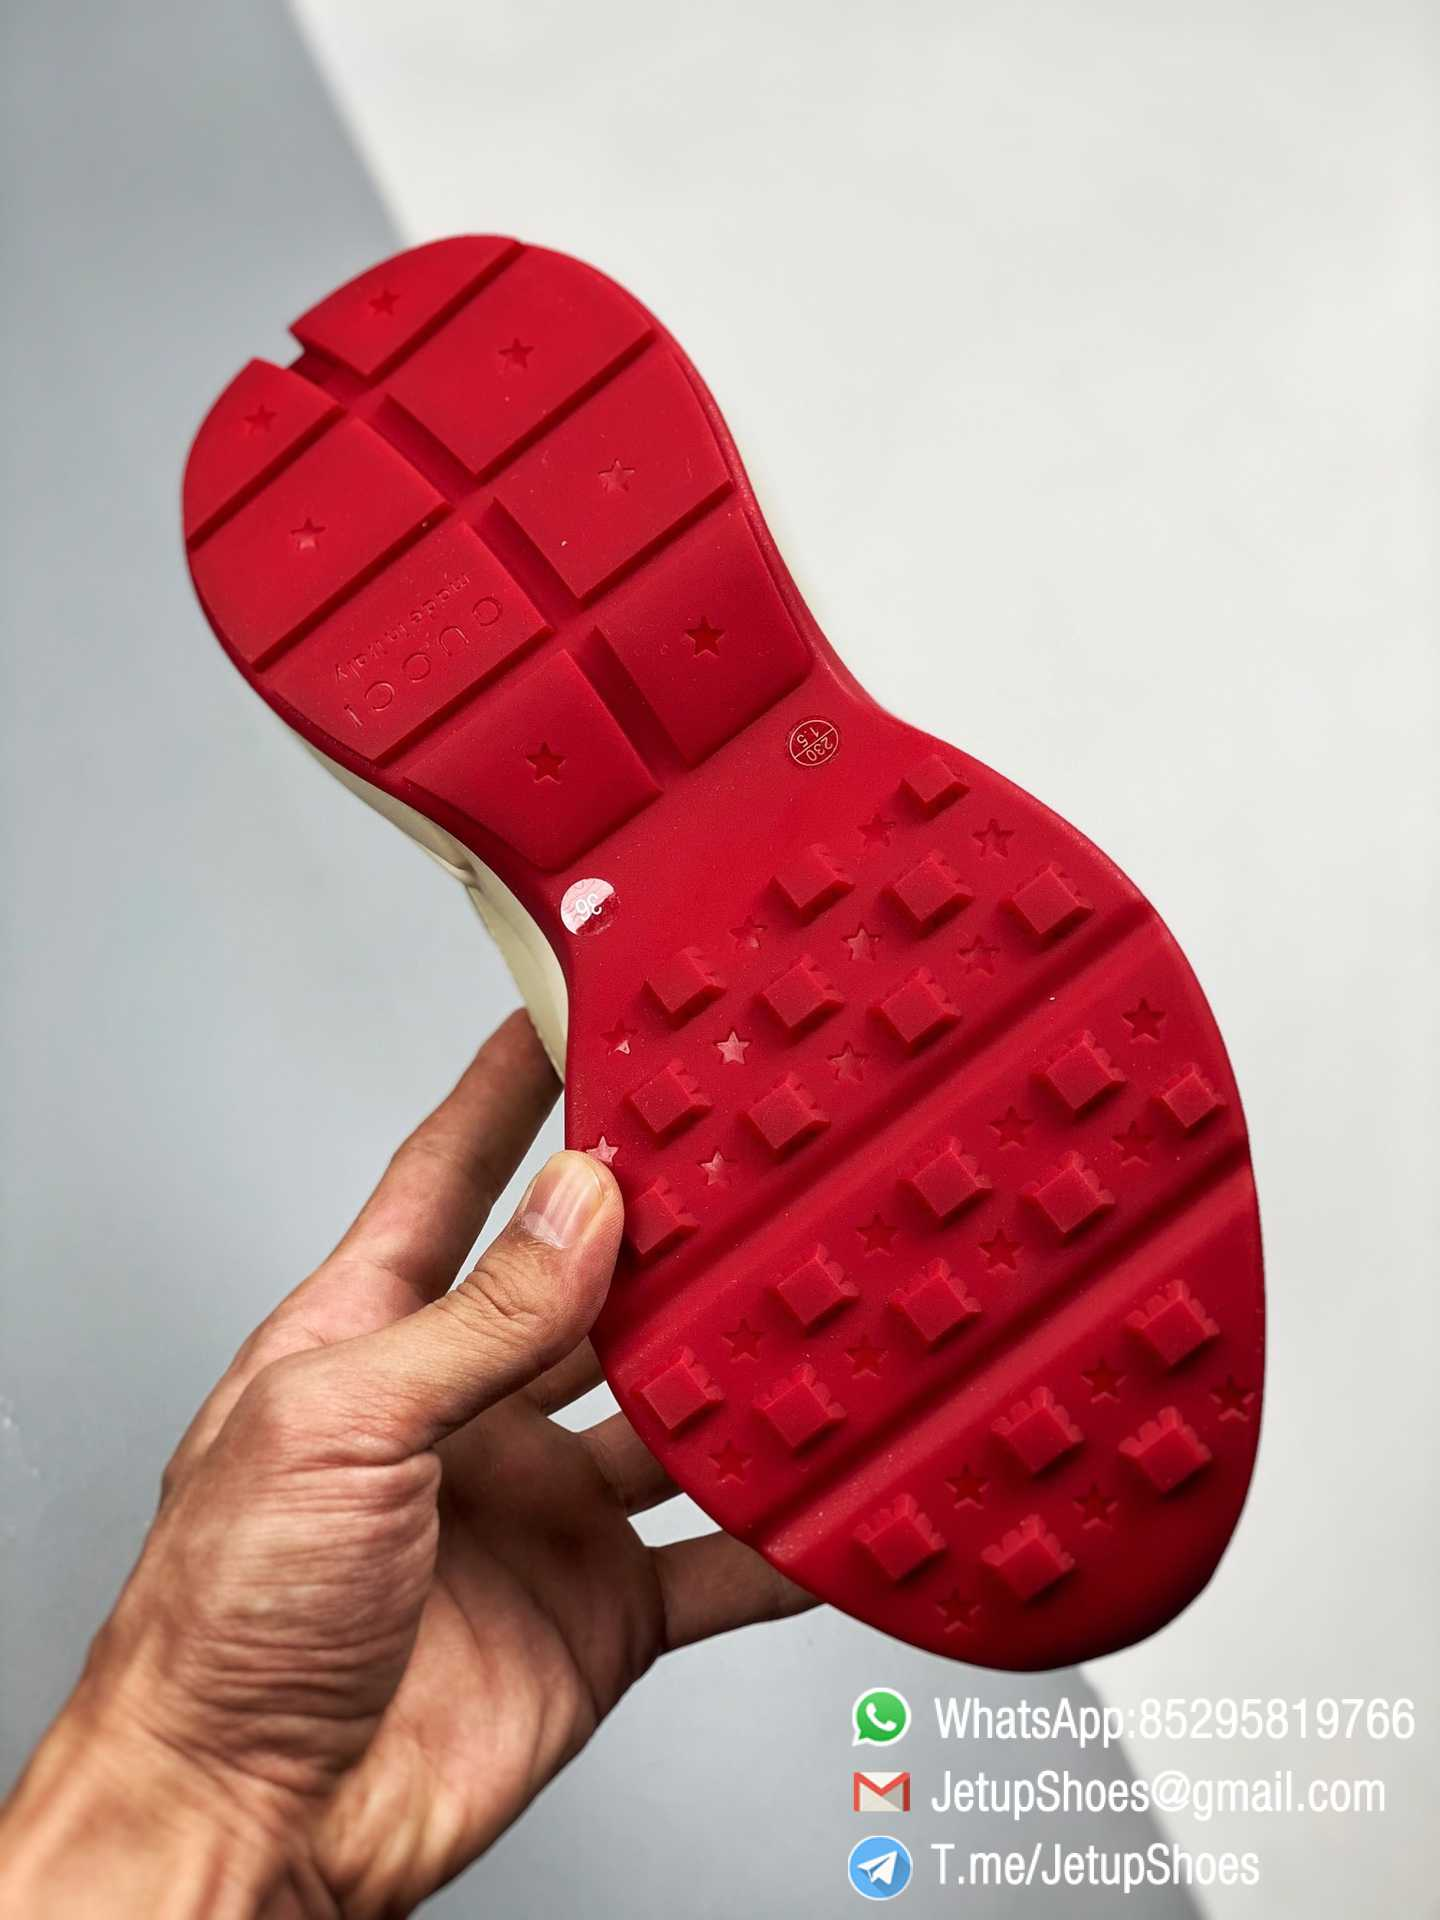 Doraemon x Gucci womens Rhyton Sneaker Special Collaboration Sneakers SKU 655037 DRW00 9522 07